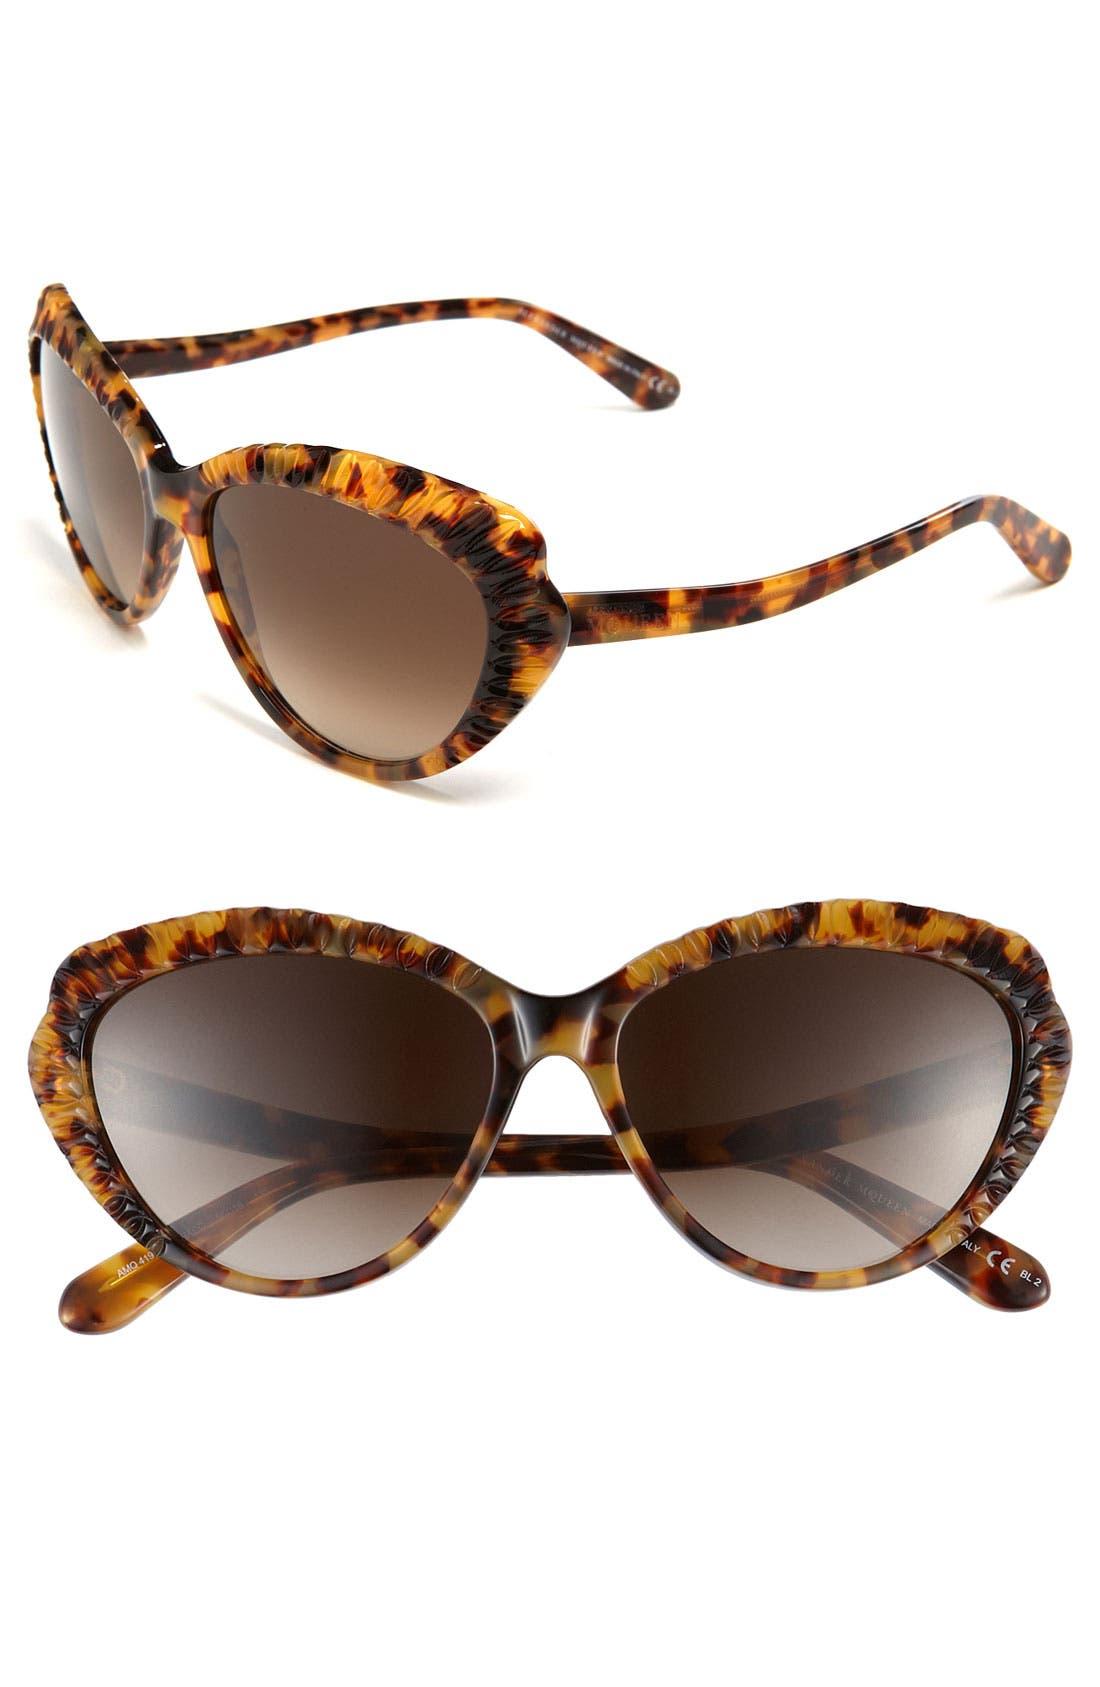 Main Image - Alexander McQueen 56mm Cat Eye Sunglasses